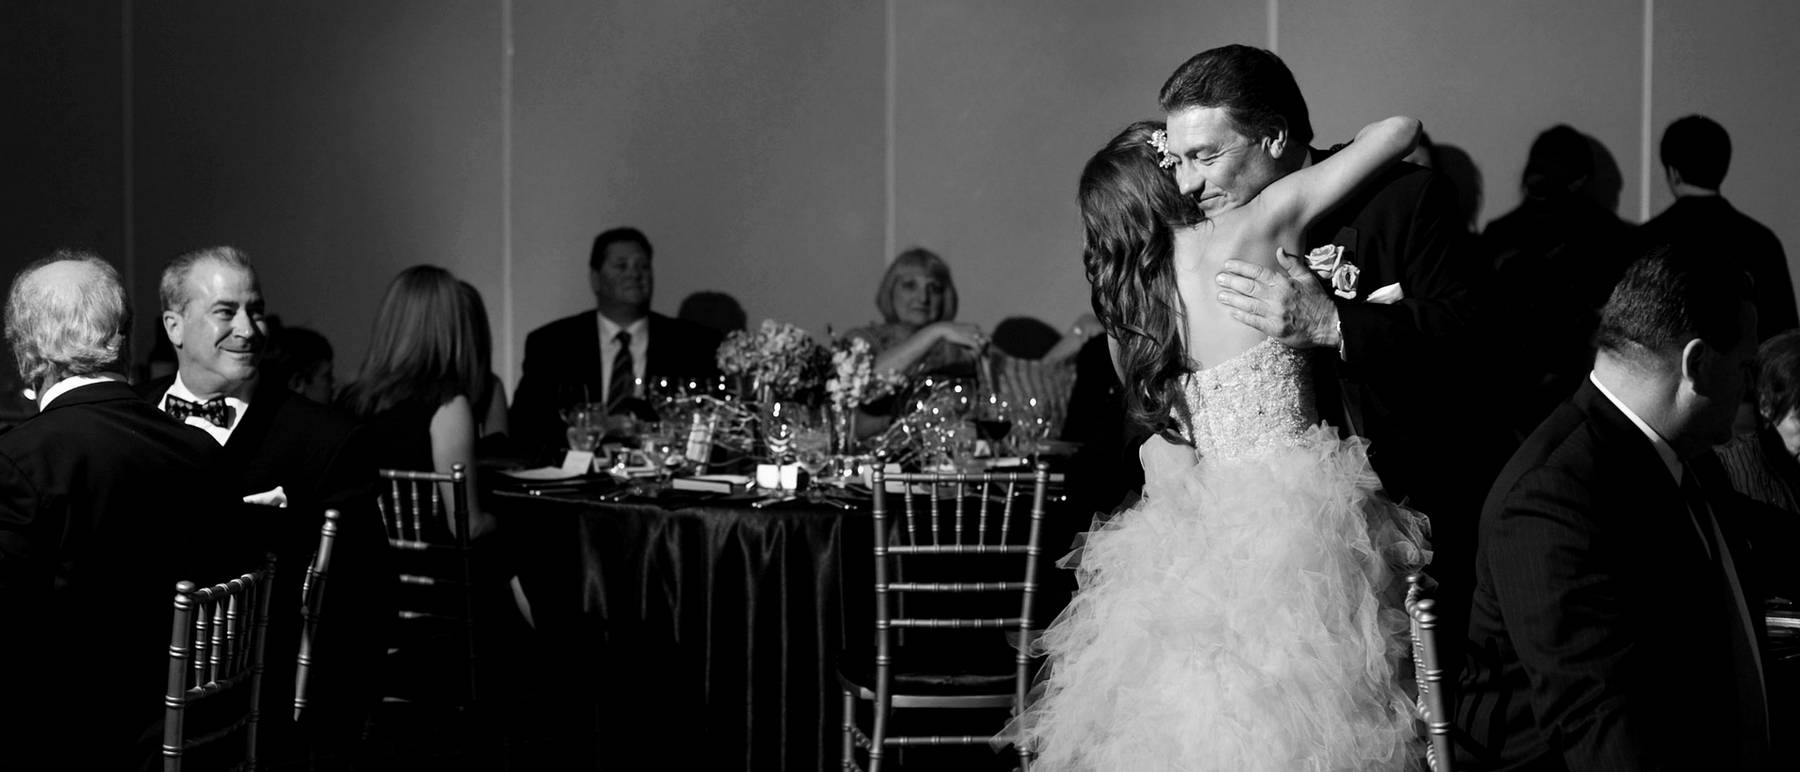 johnandjoseph-wedding-photographer-hz-slider-187